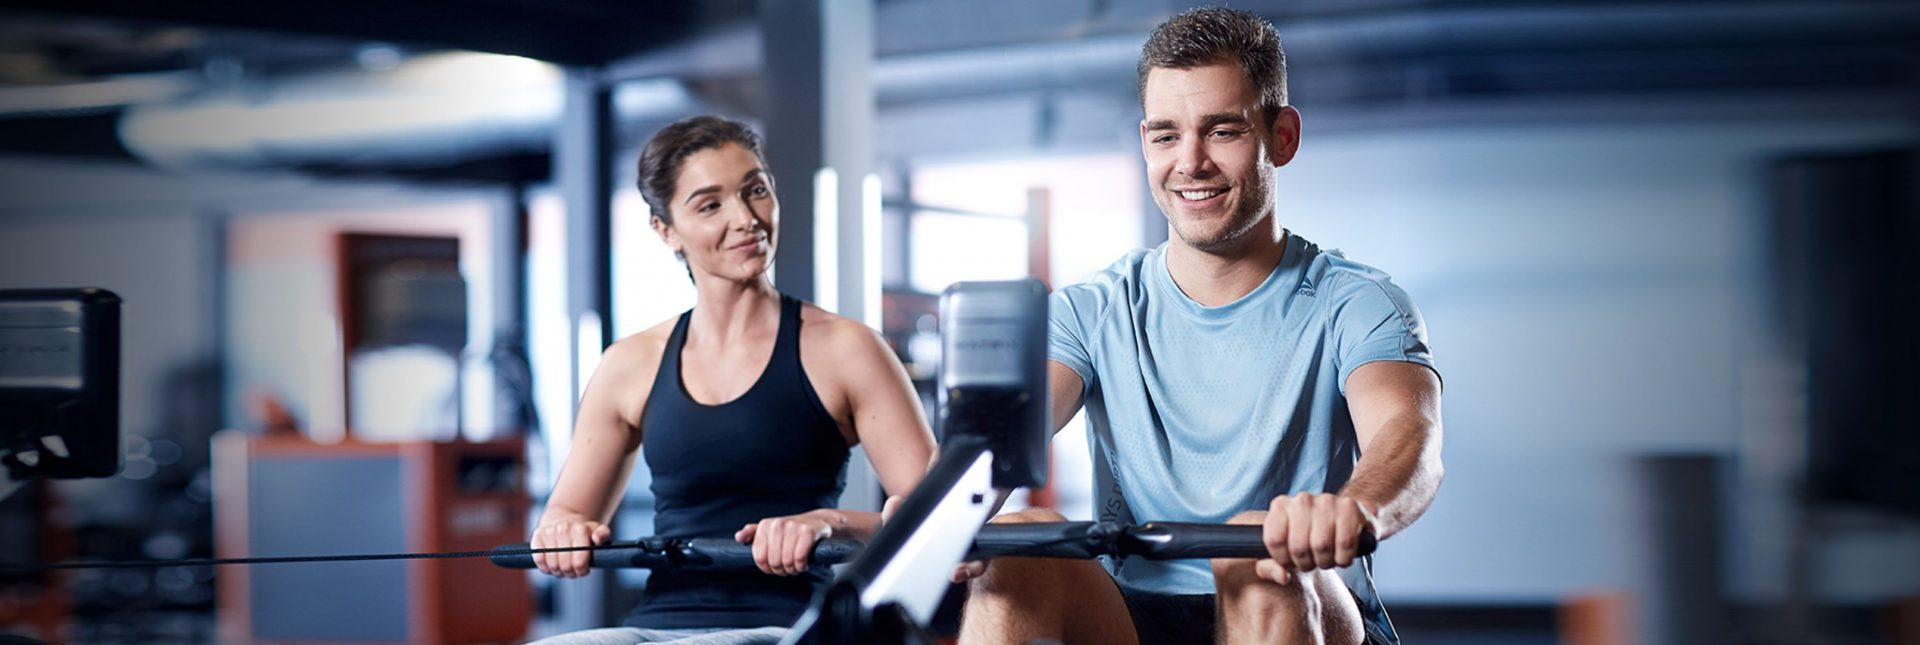 Great Benefits of Stationary Bike Workout